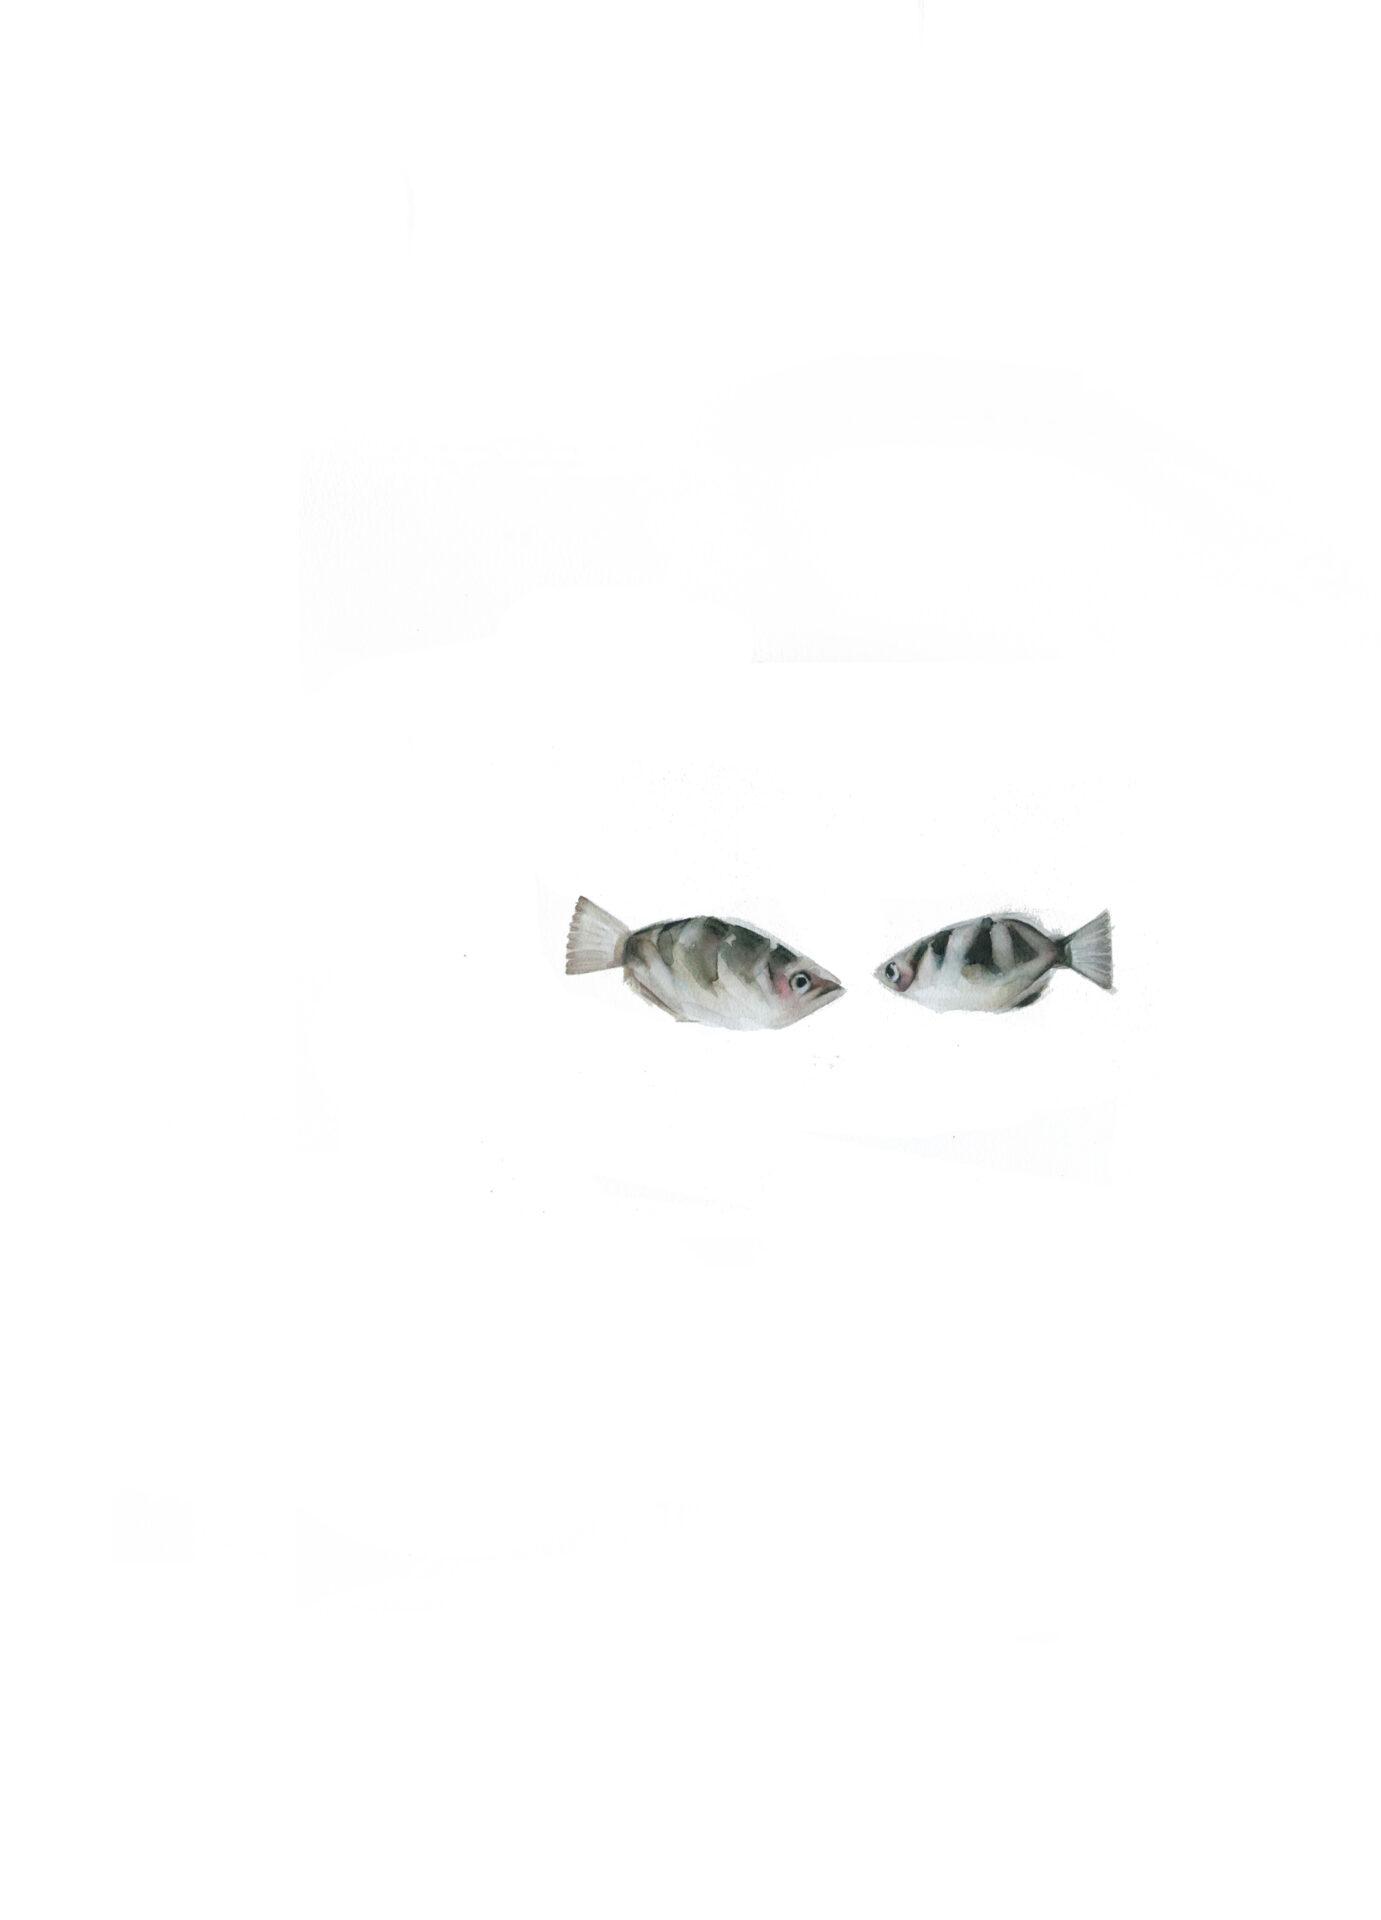 peces rayas